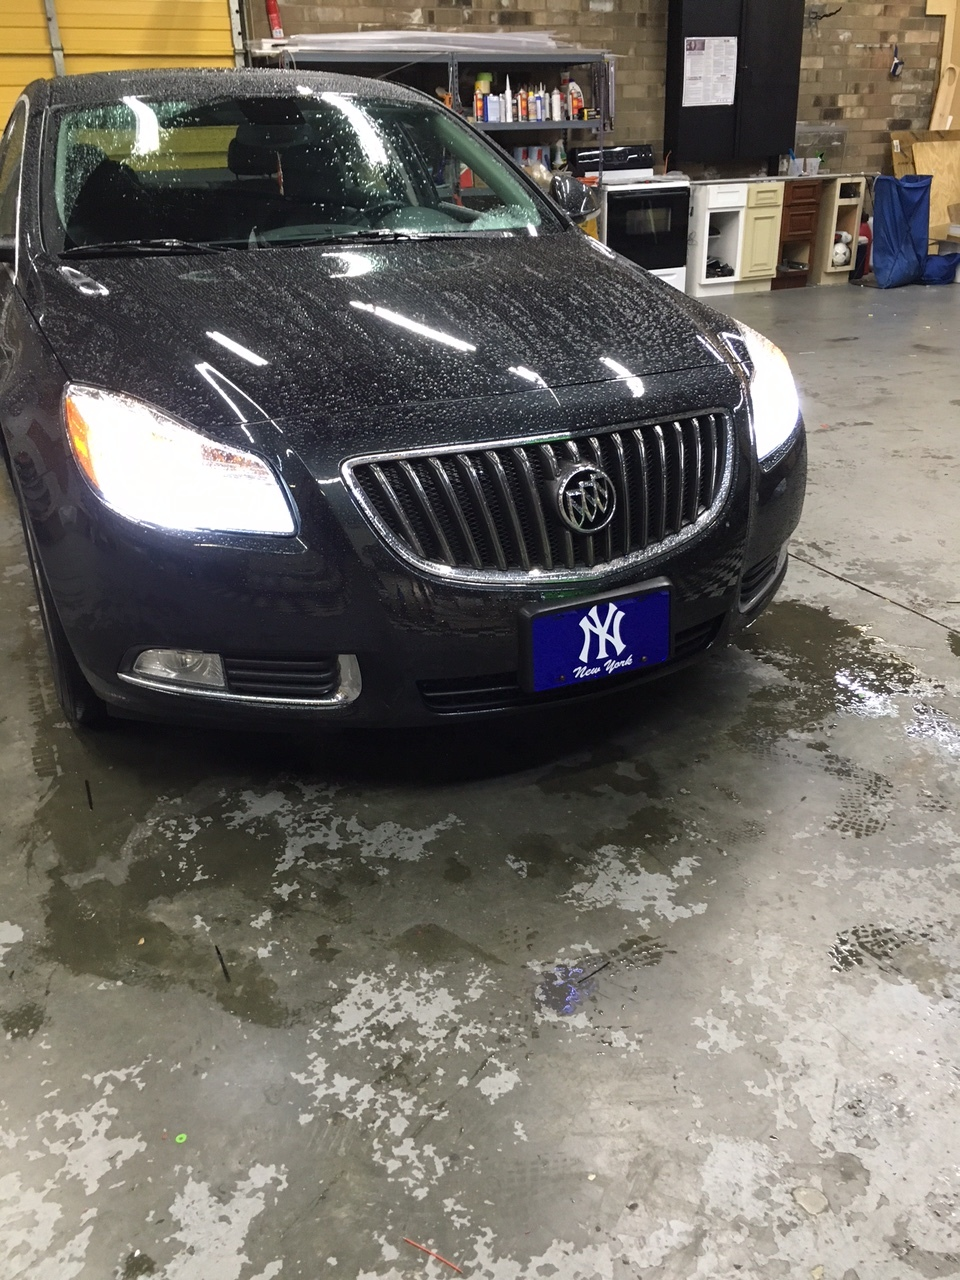 Buick Regal.JPG